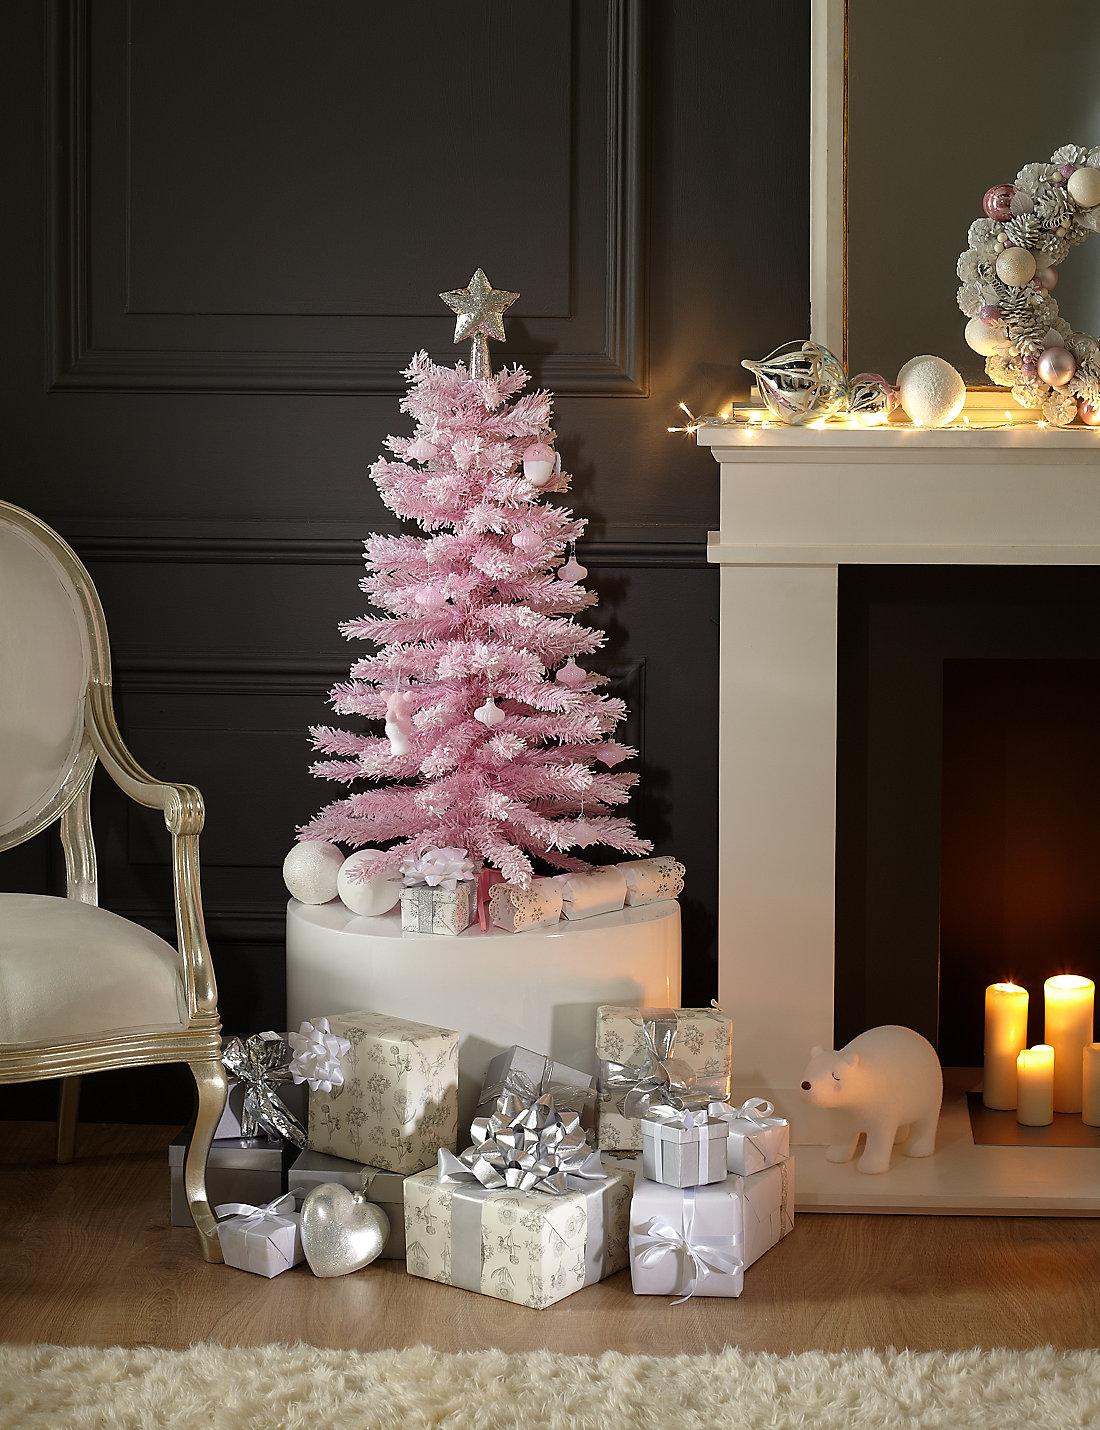 3ft snow effect pink christmas tree - 3 Ft Christmas Tree